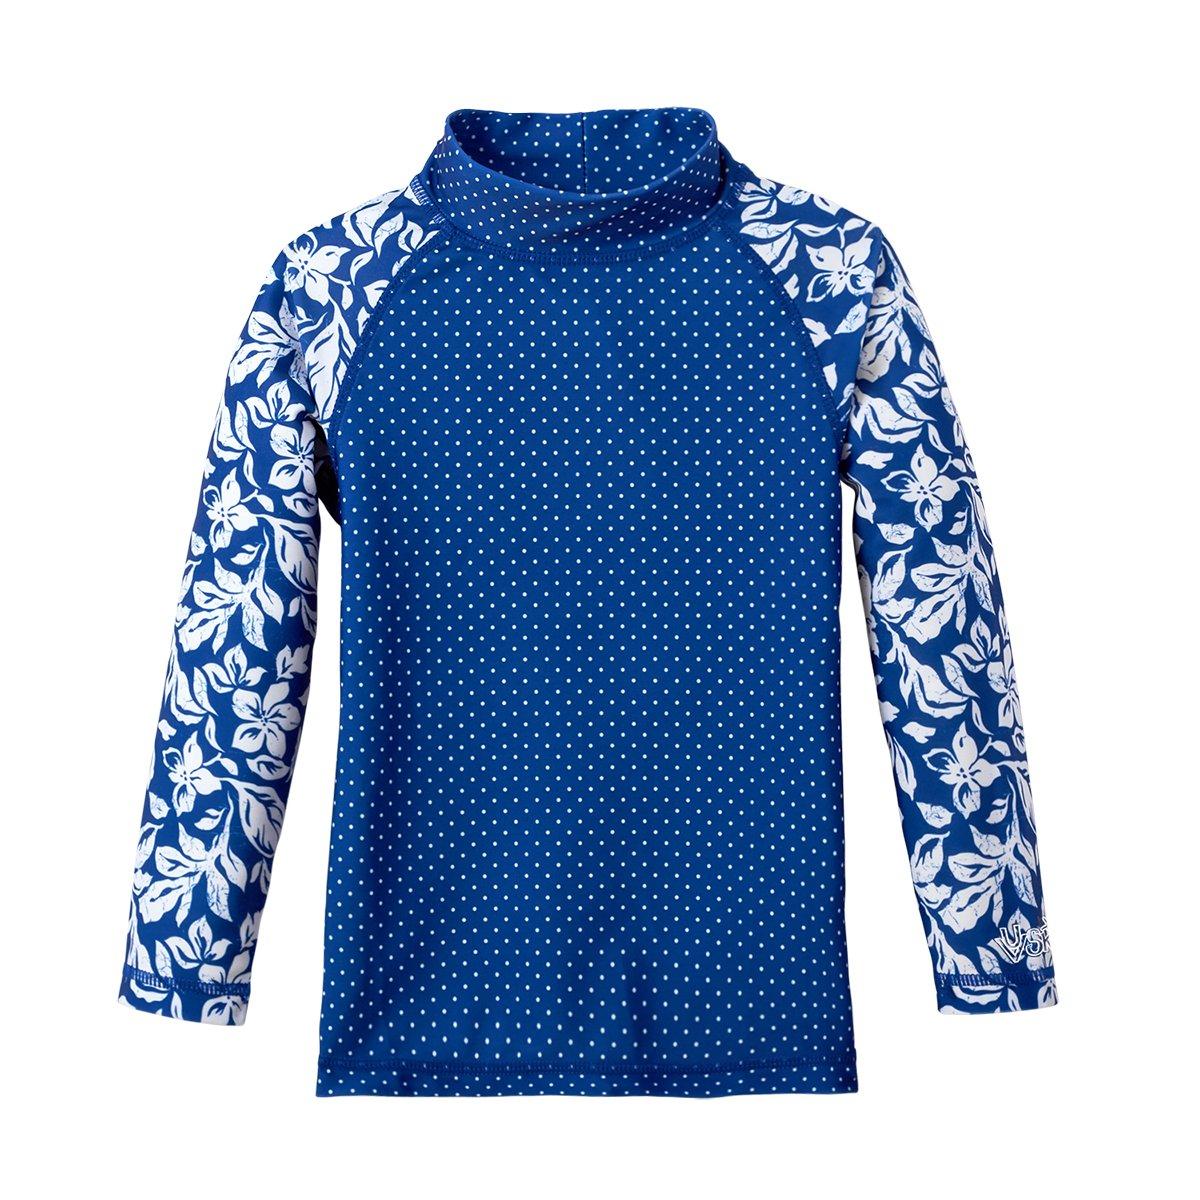 UV Skinz UPF 50+ Girls Long Sleeve Sun & Swim Shirt